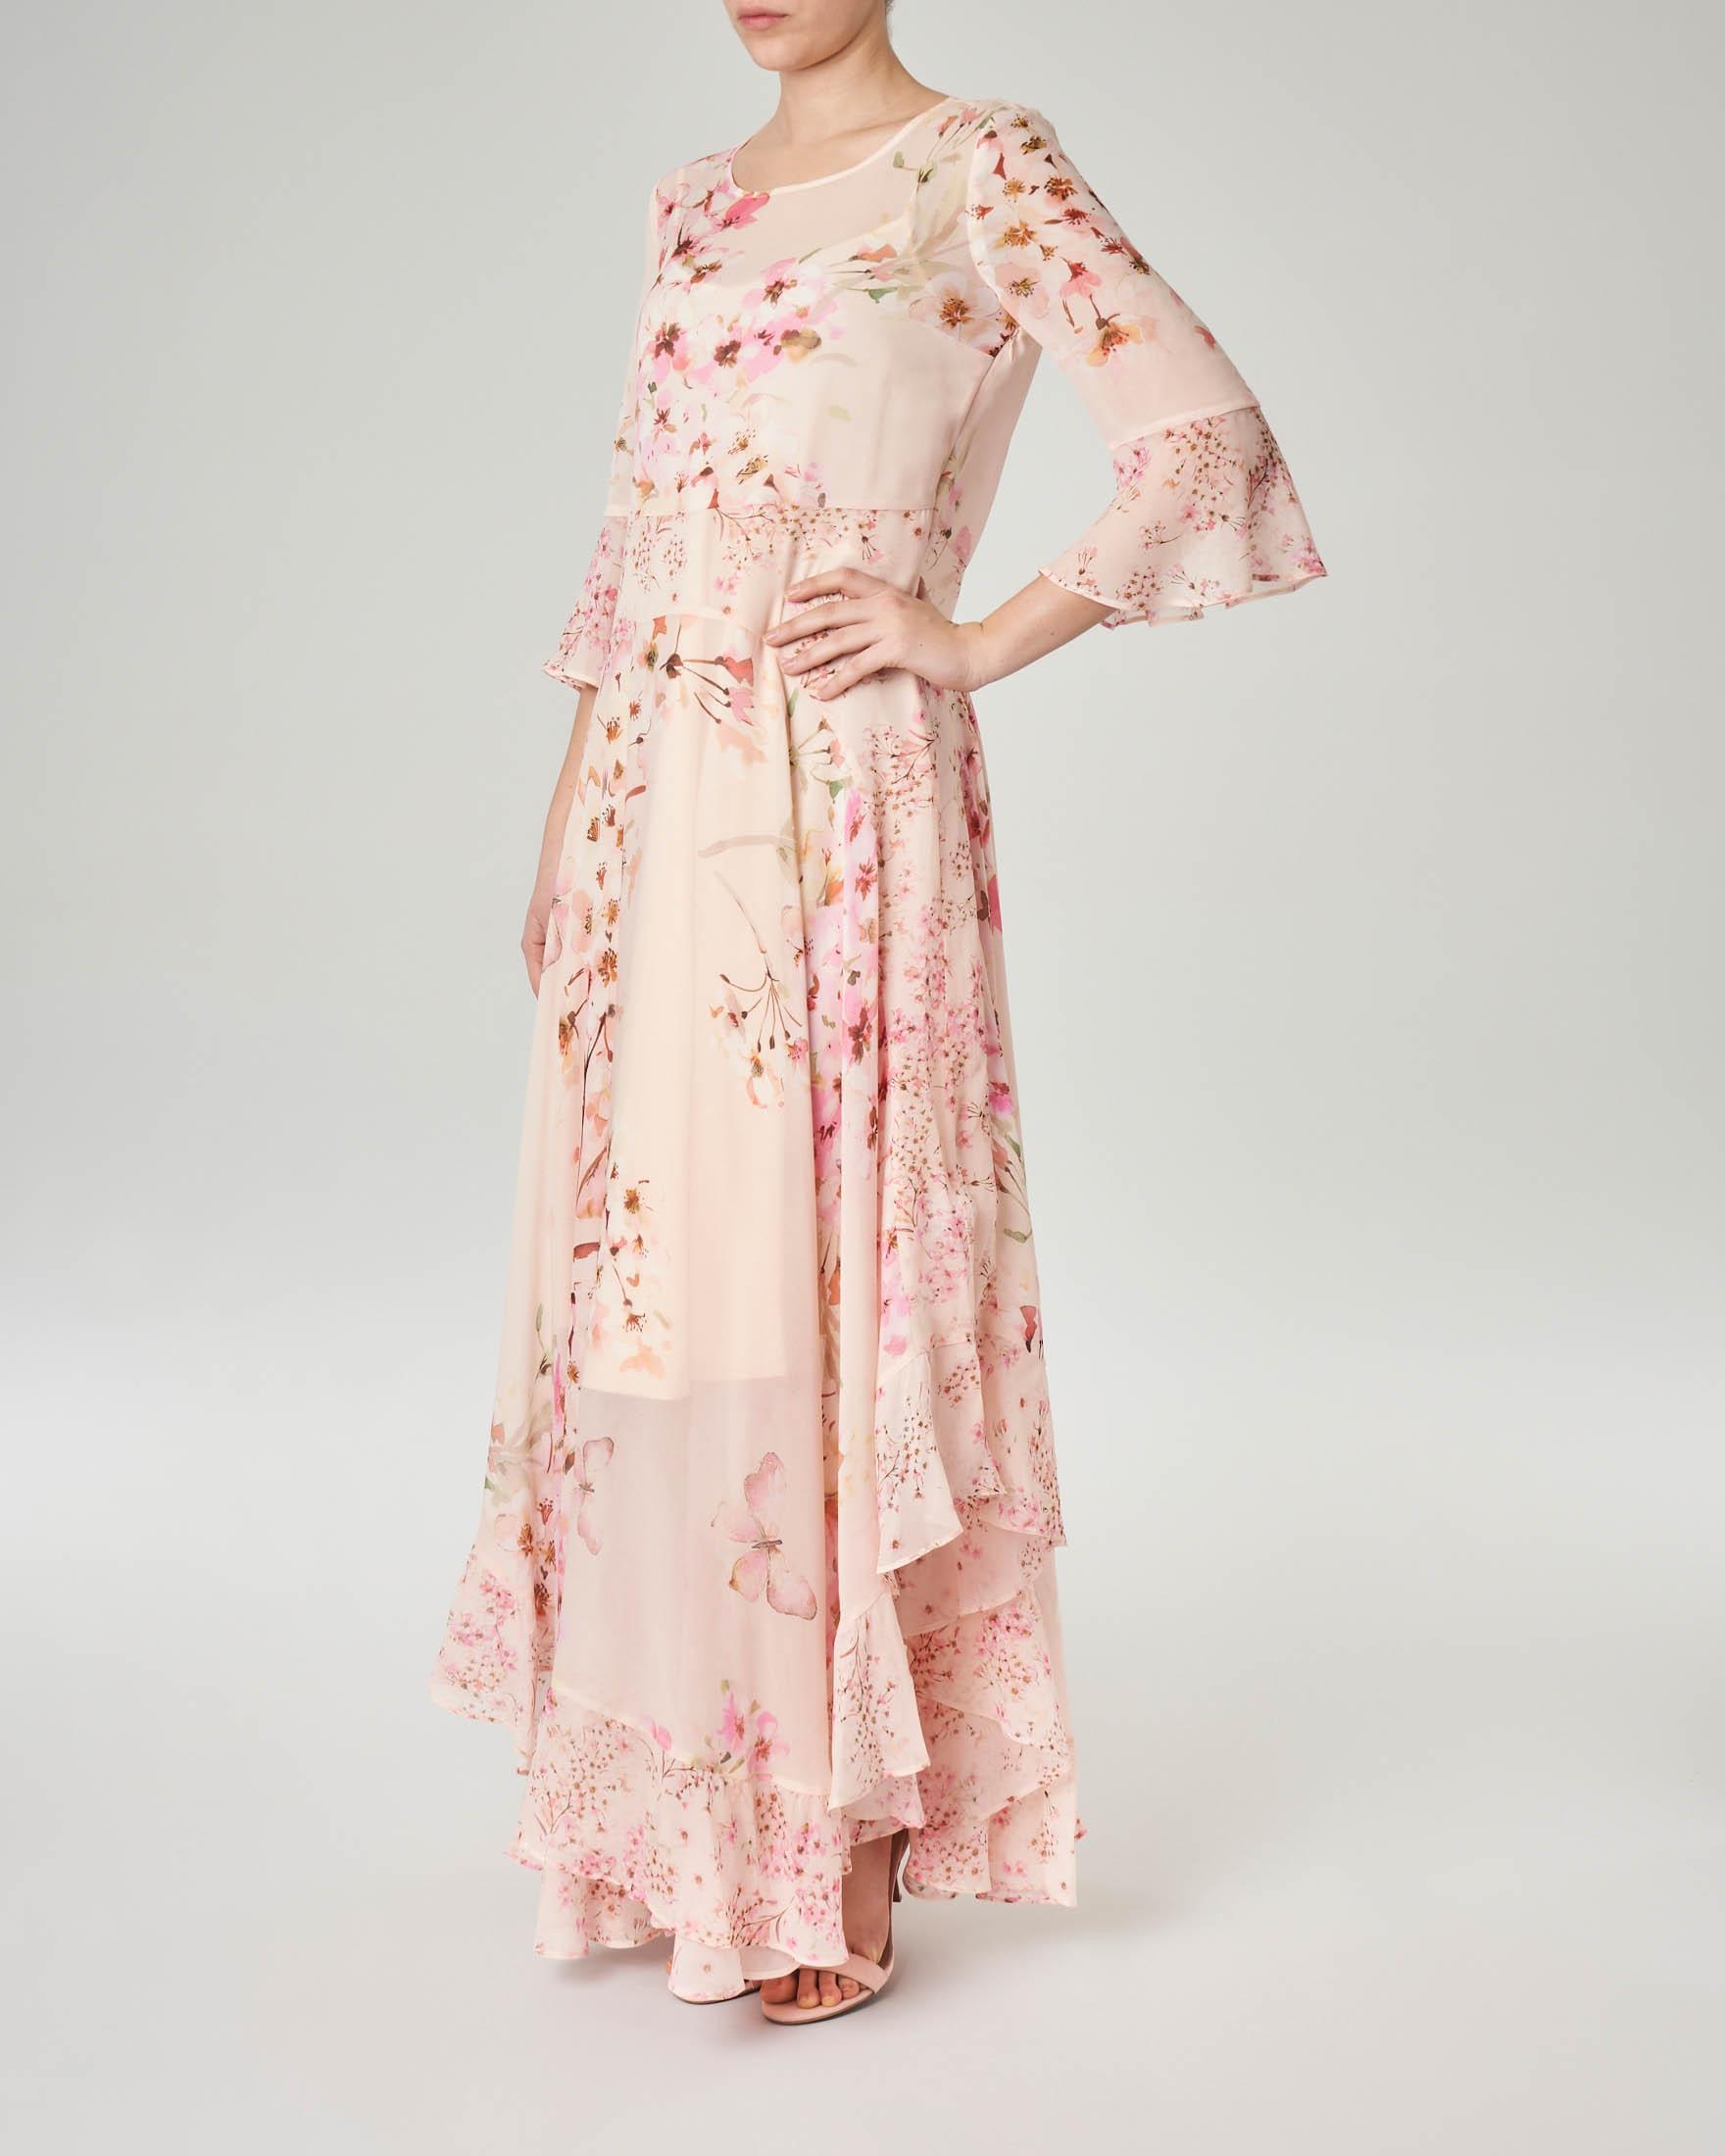 new product bb806 1df00 Abito lungo rosa in georgette a fantasia floreale